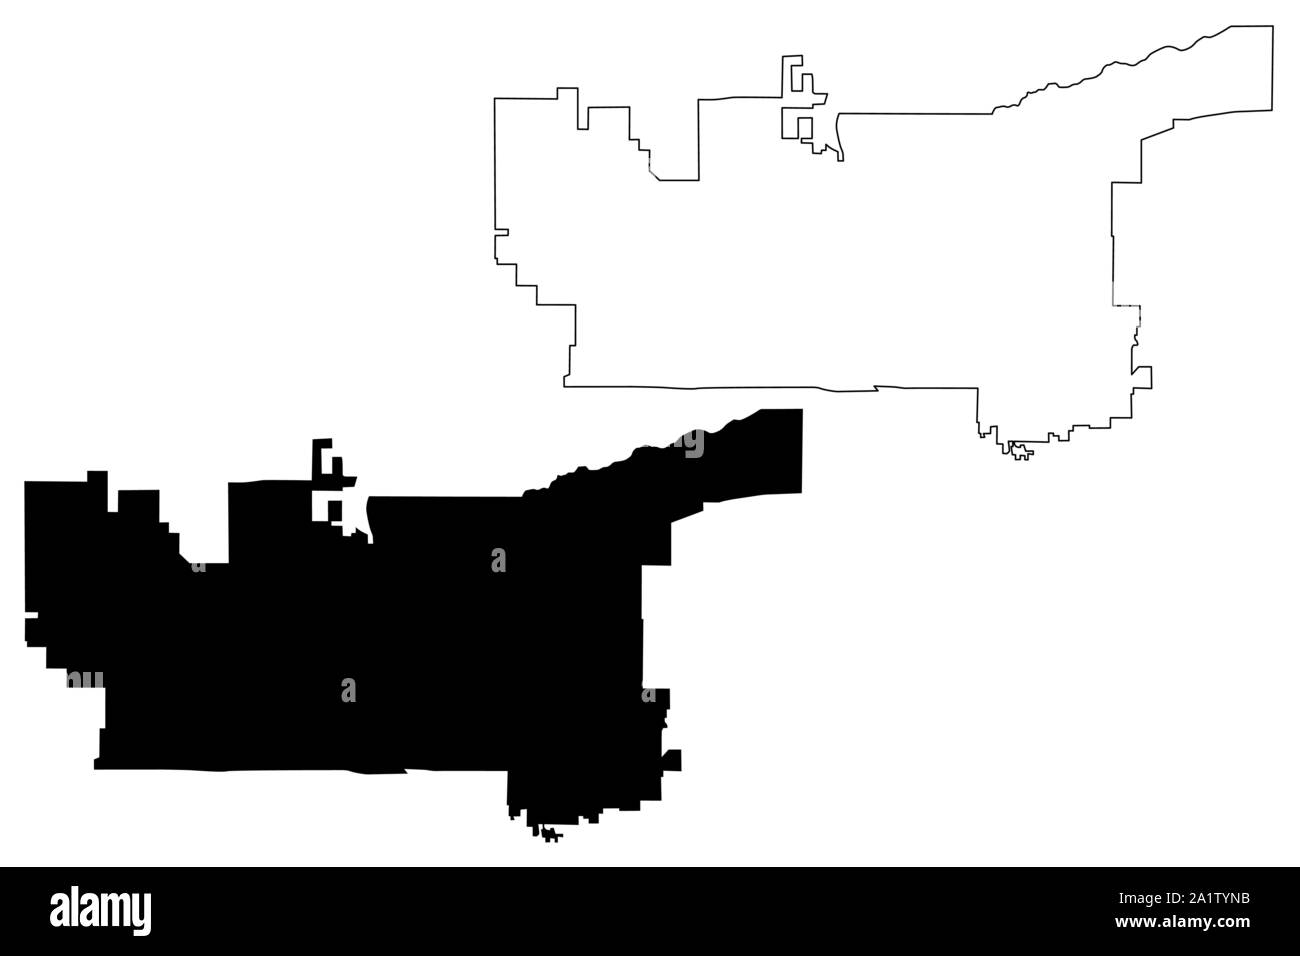 Salt Lake City (United States cities, United States of ... Salt Lake City Usa Map on usa map san francisco, usa map buffalo, usa map united states, usa map orange county, usa map fort lauderdale, usa map grand rapids, usa map las vegas, usa map santa fe, usa map chattanooga, usa map tampa, usa map moab, usa map with states, usa map great salt lake, usa map harrisburg, usa map cincinnati, usa map savannah, usa map wichita, usa map charleston, usa map fort worth, usa map guam,